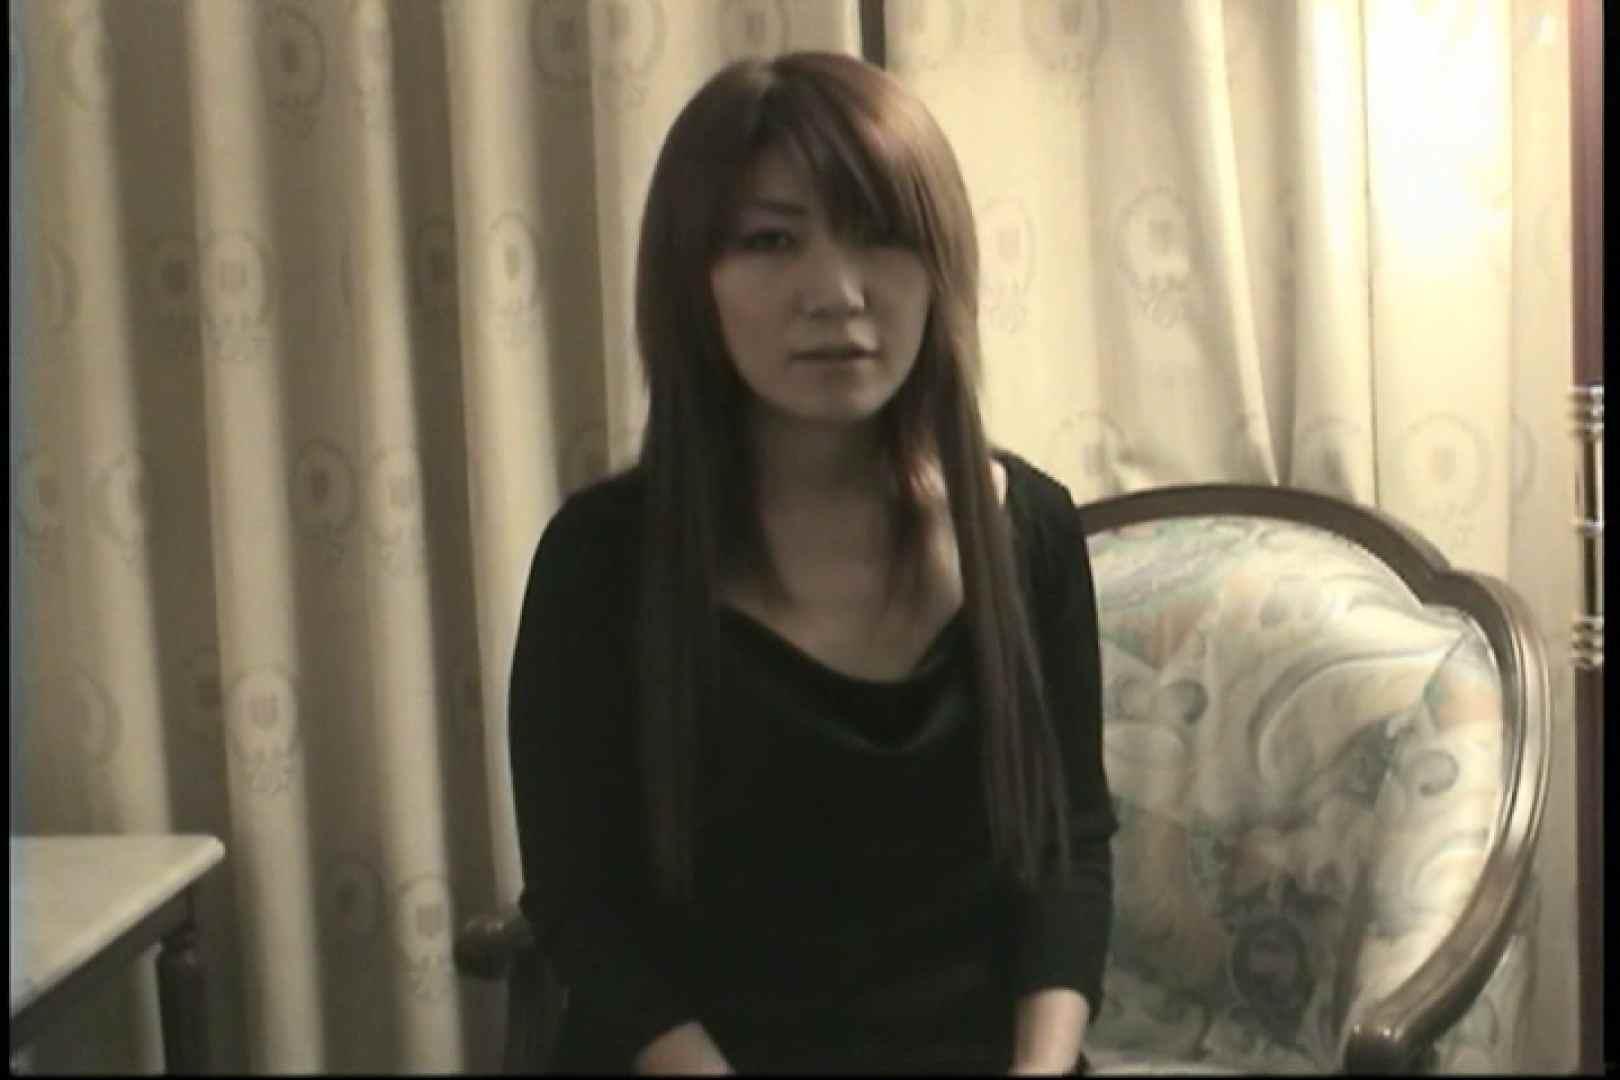 H大好きな清楚系の美ボディお姉さんとホテルでSEX~安西みか~ ホテル おまんこ無修正動画無料 60pic 9